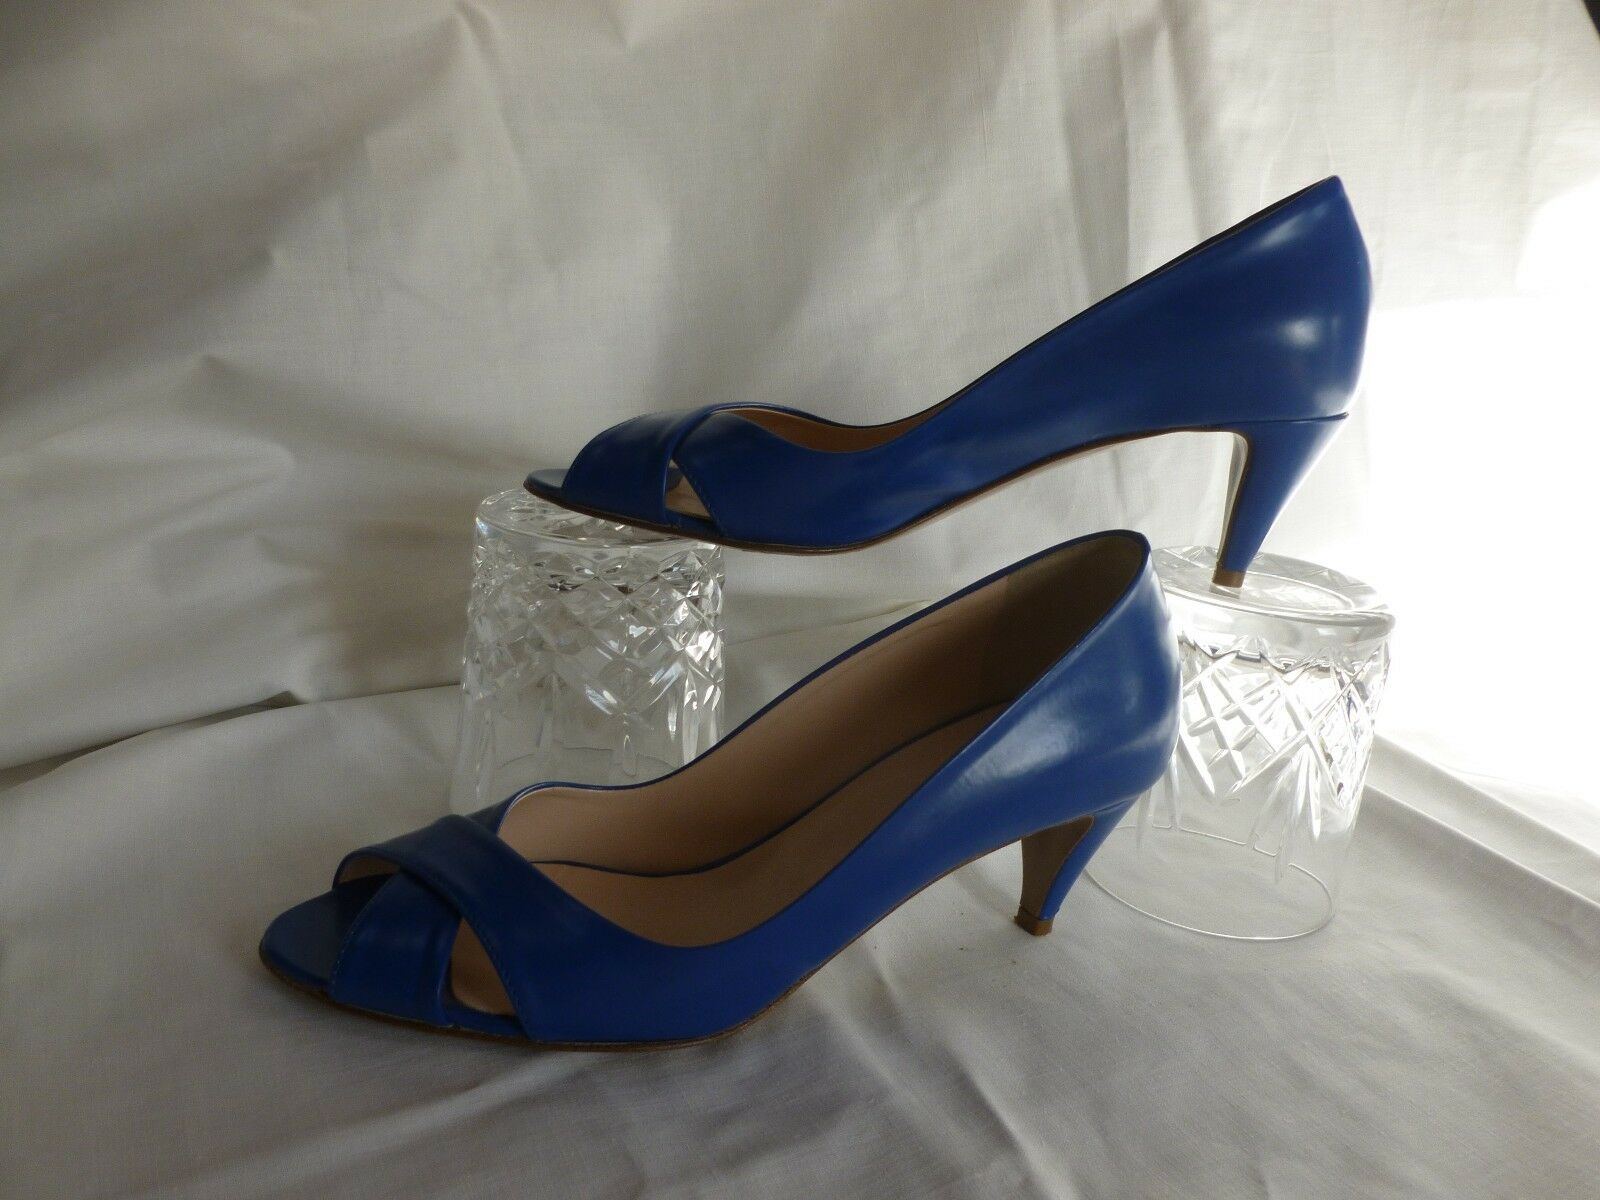 HOBBS  MADE IN ITALY  Blau   Schuhe  UK 3. 5    EU 36